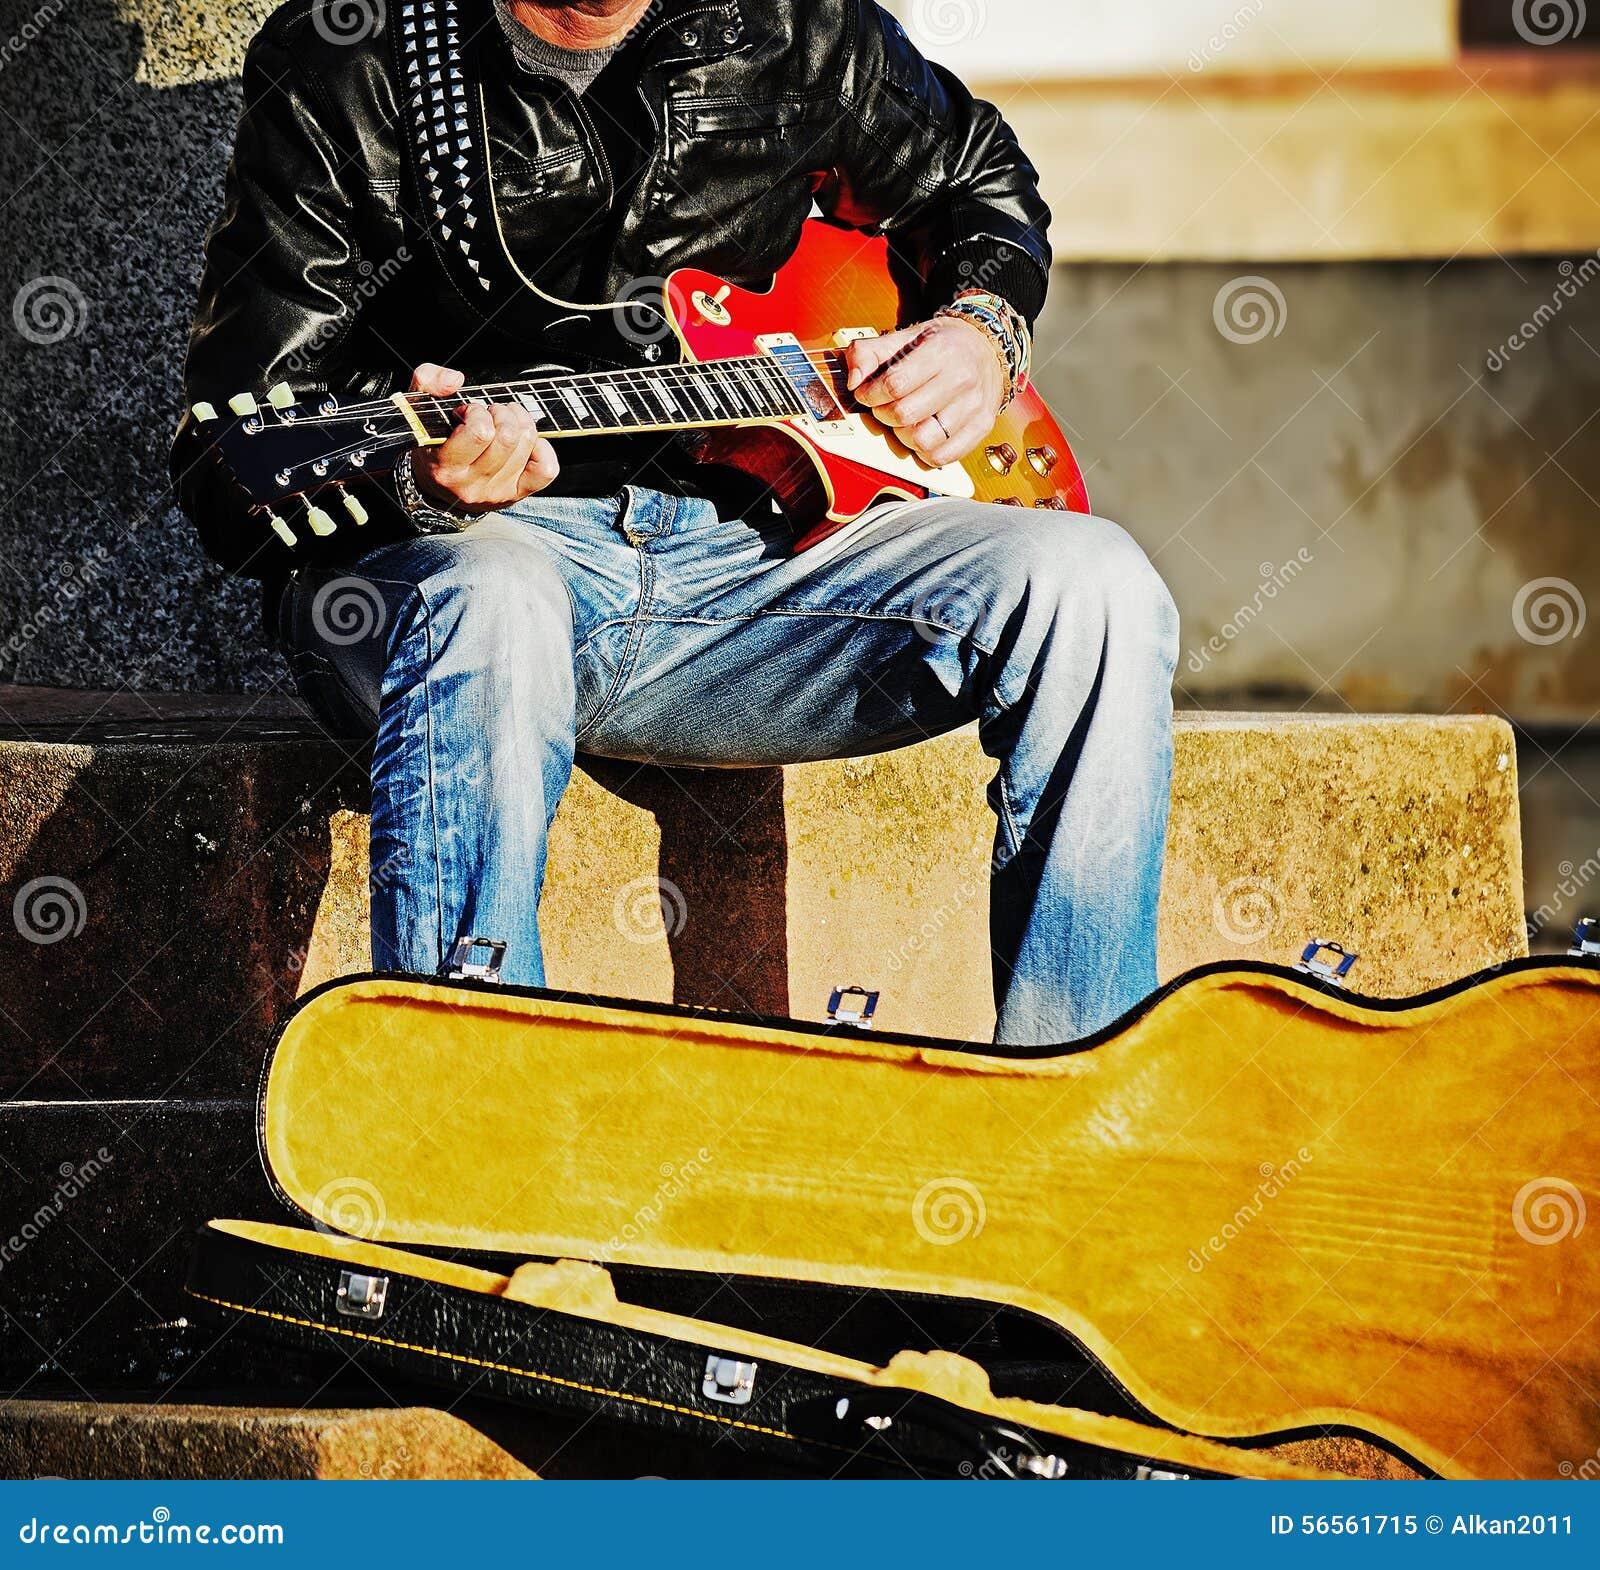 Download Κιθαρίστας με μια ανοικτή περίπτωση κιθάρων Στοκ Εικόνα - εικόνα από μελωδία, χόμπι: 56561715